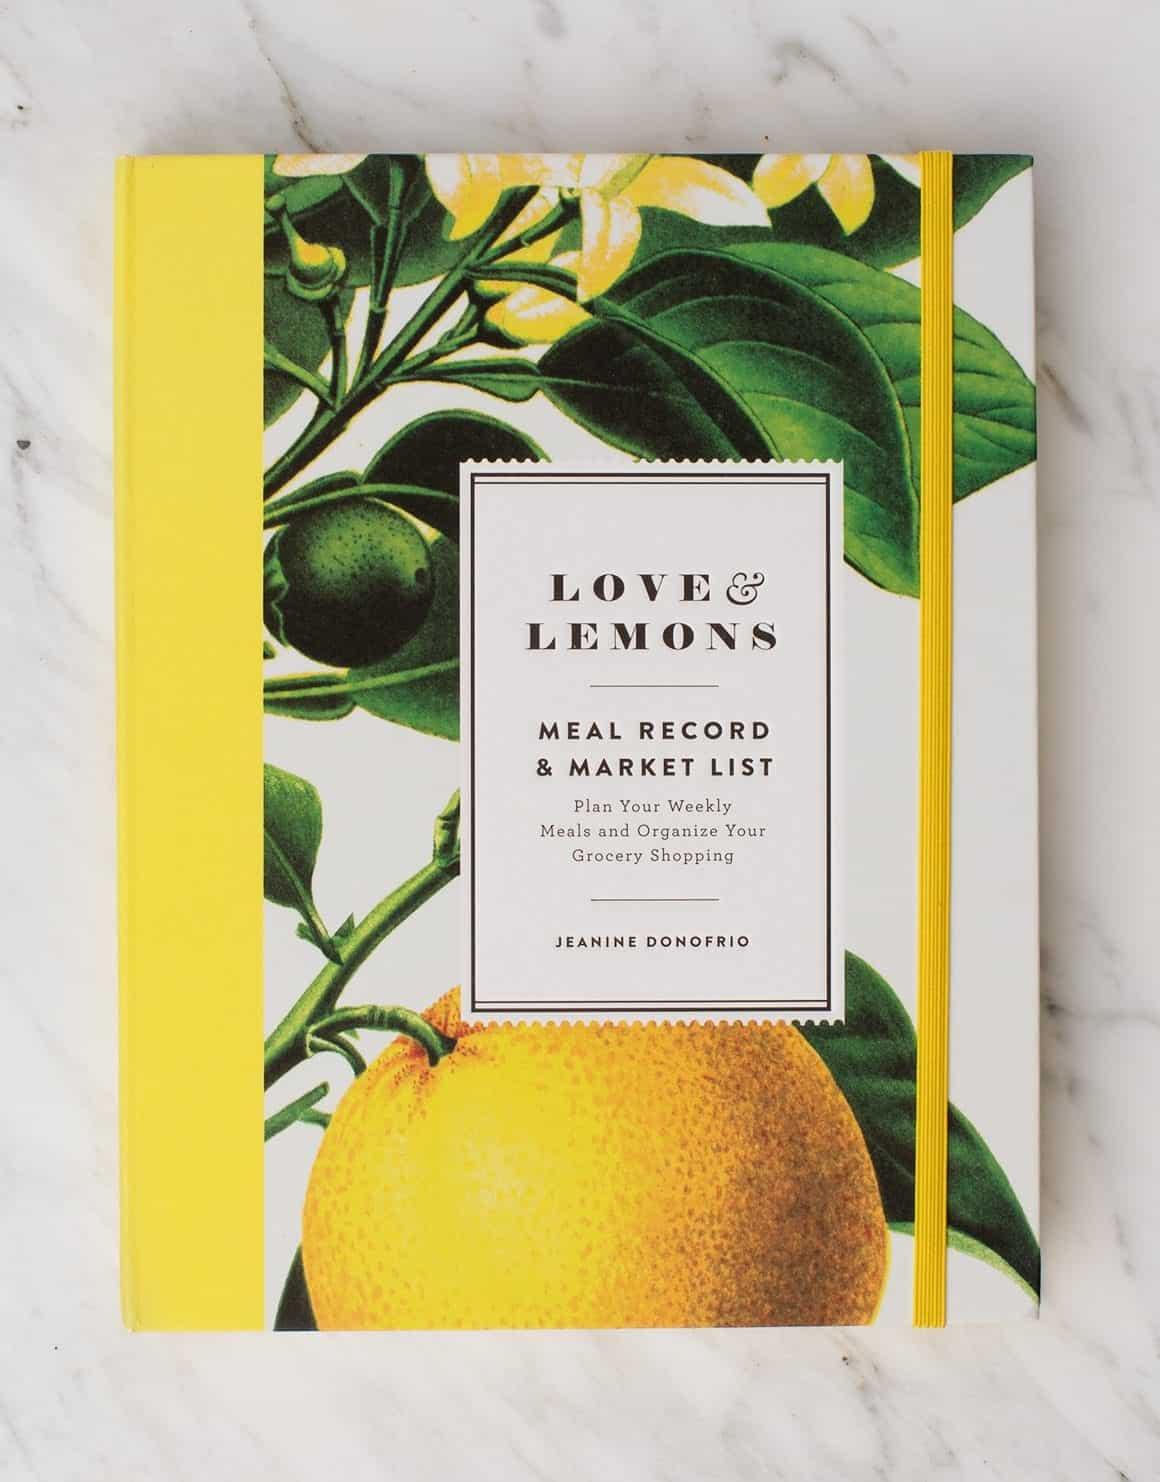 The Love & Lemons Meal Record & Market List